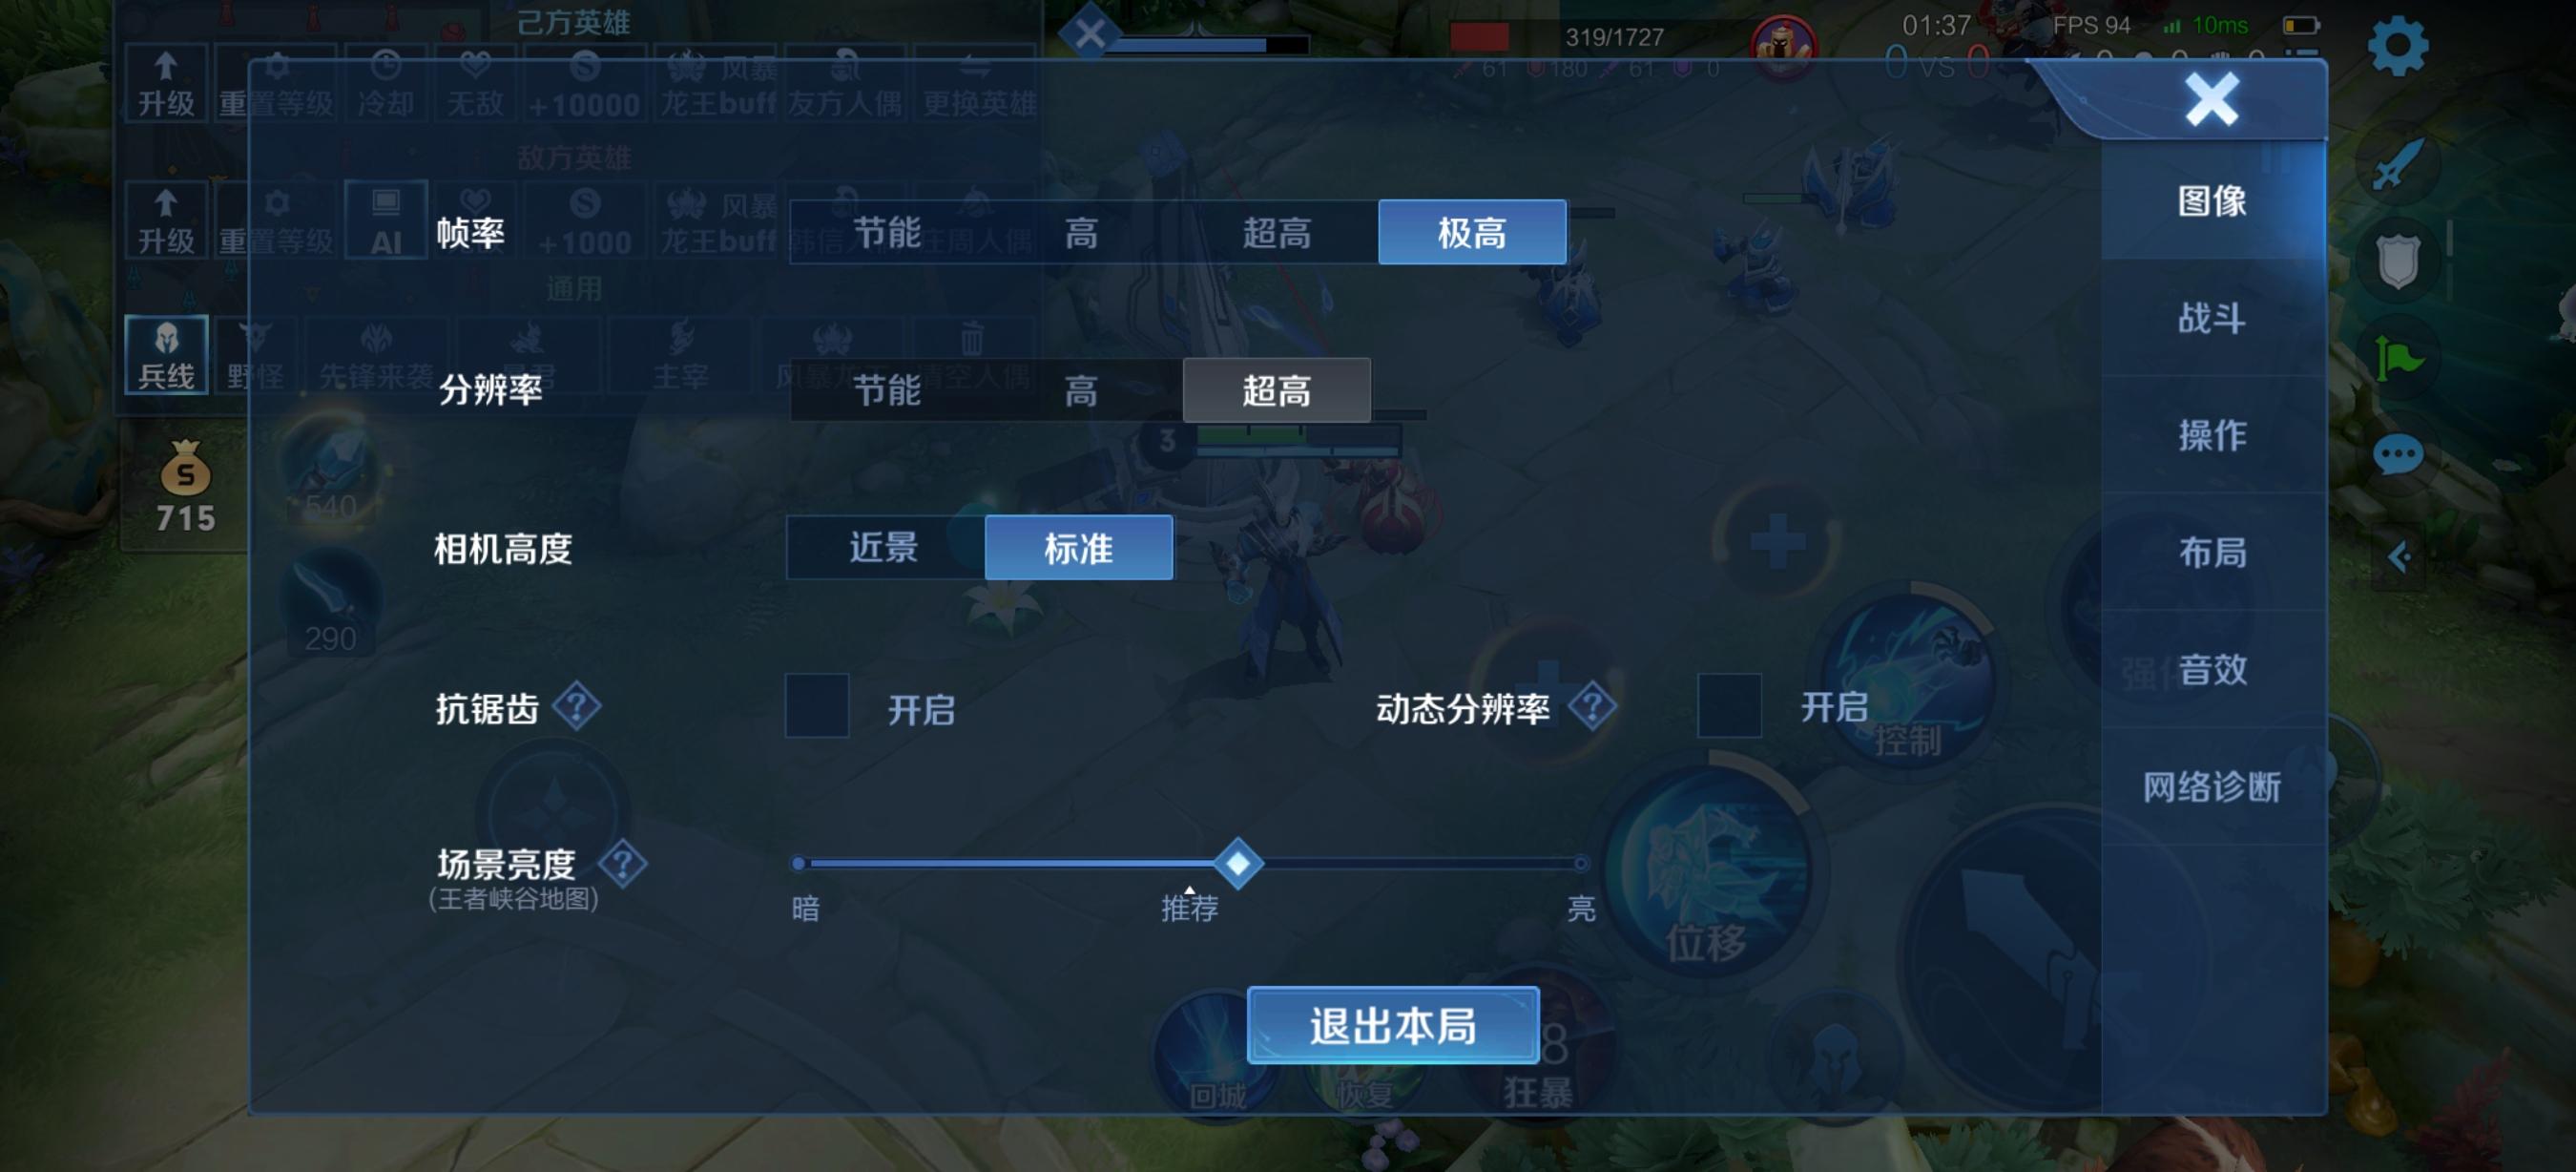 Screenshot_20211014_155559_com.tencent.tmgp.sgame.jpg